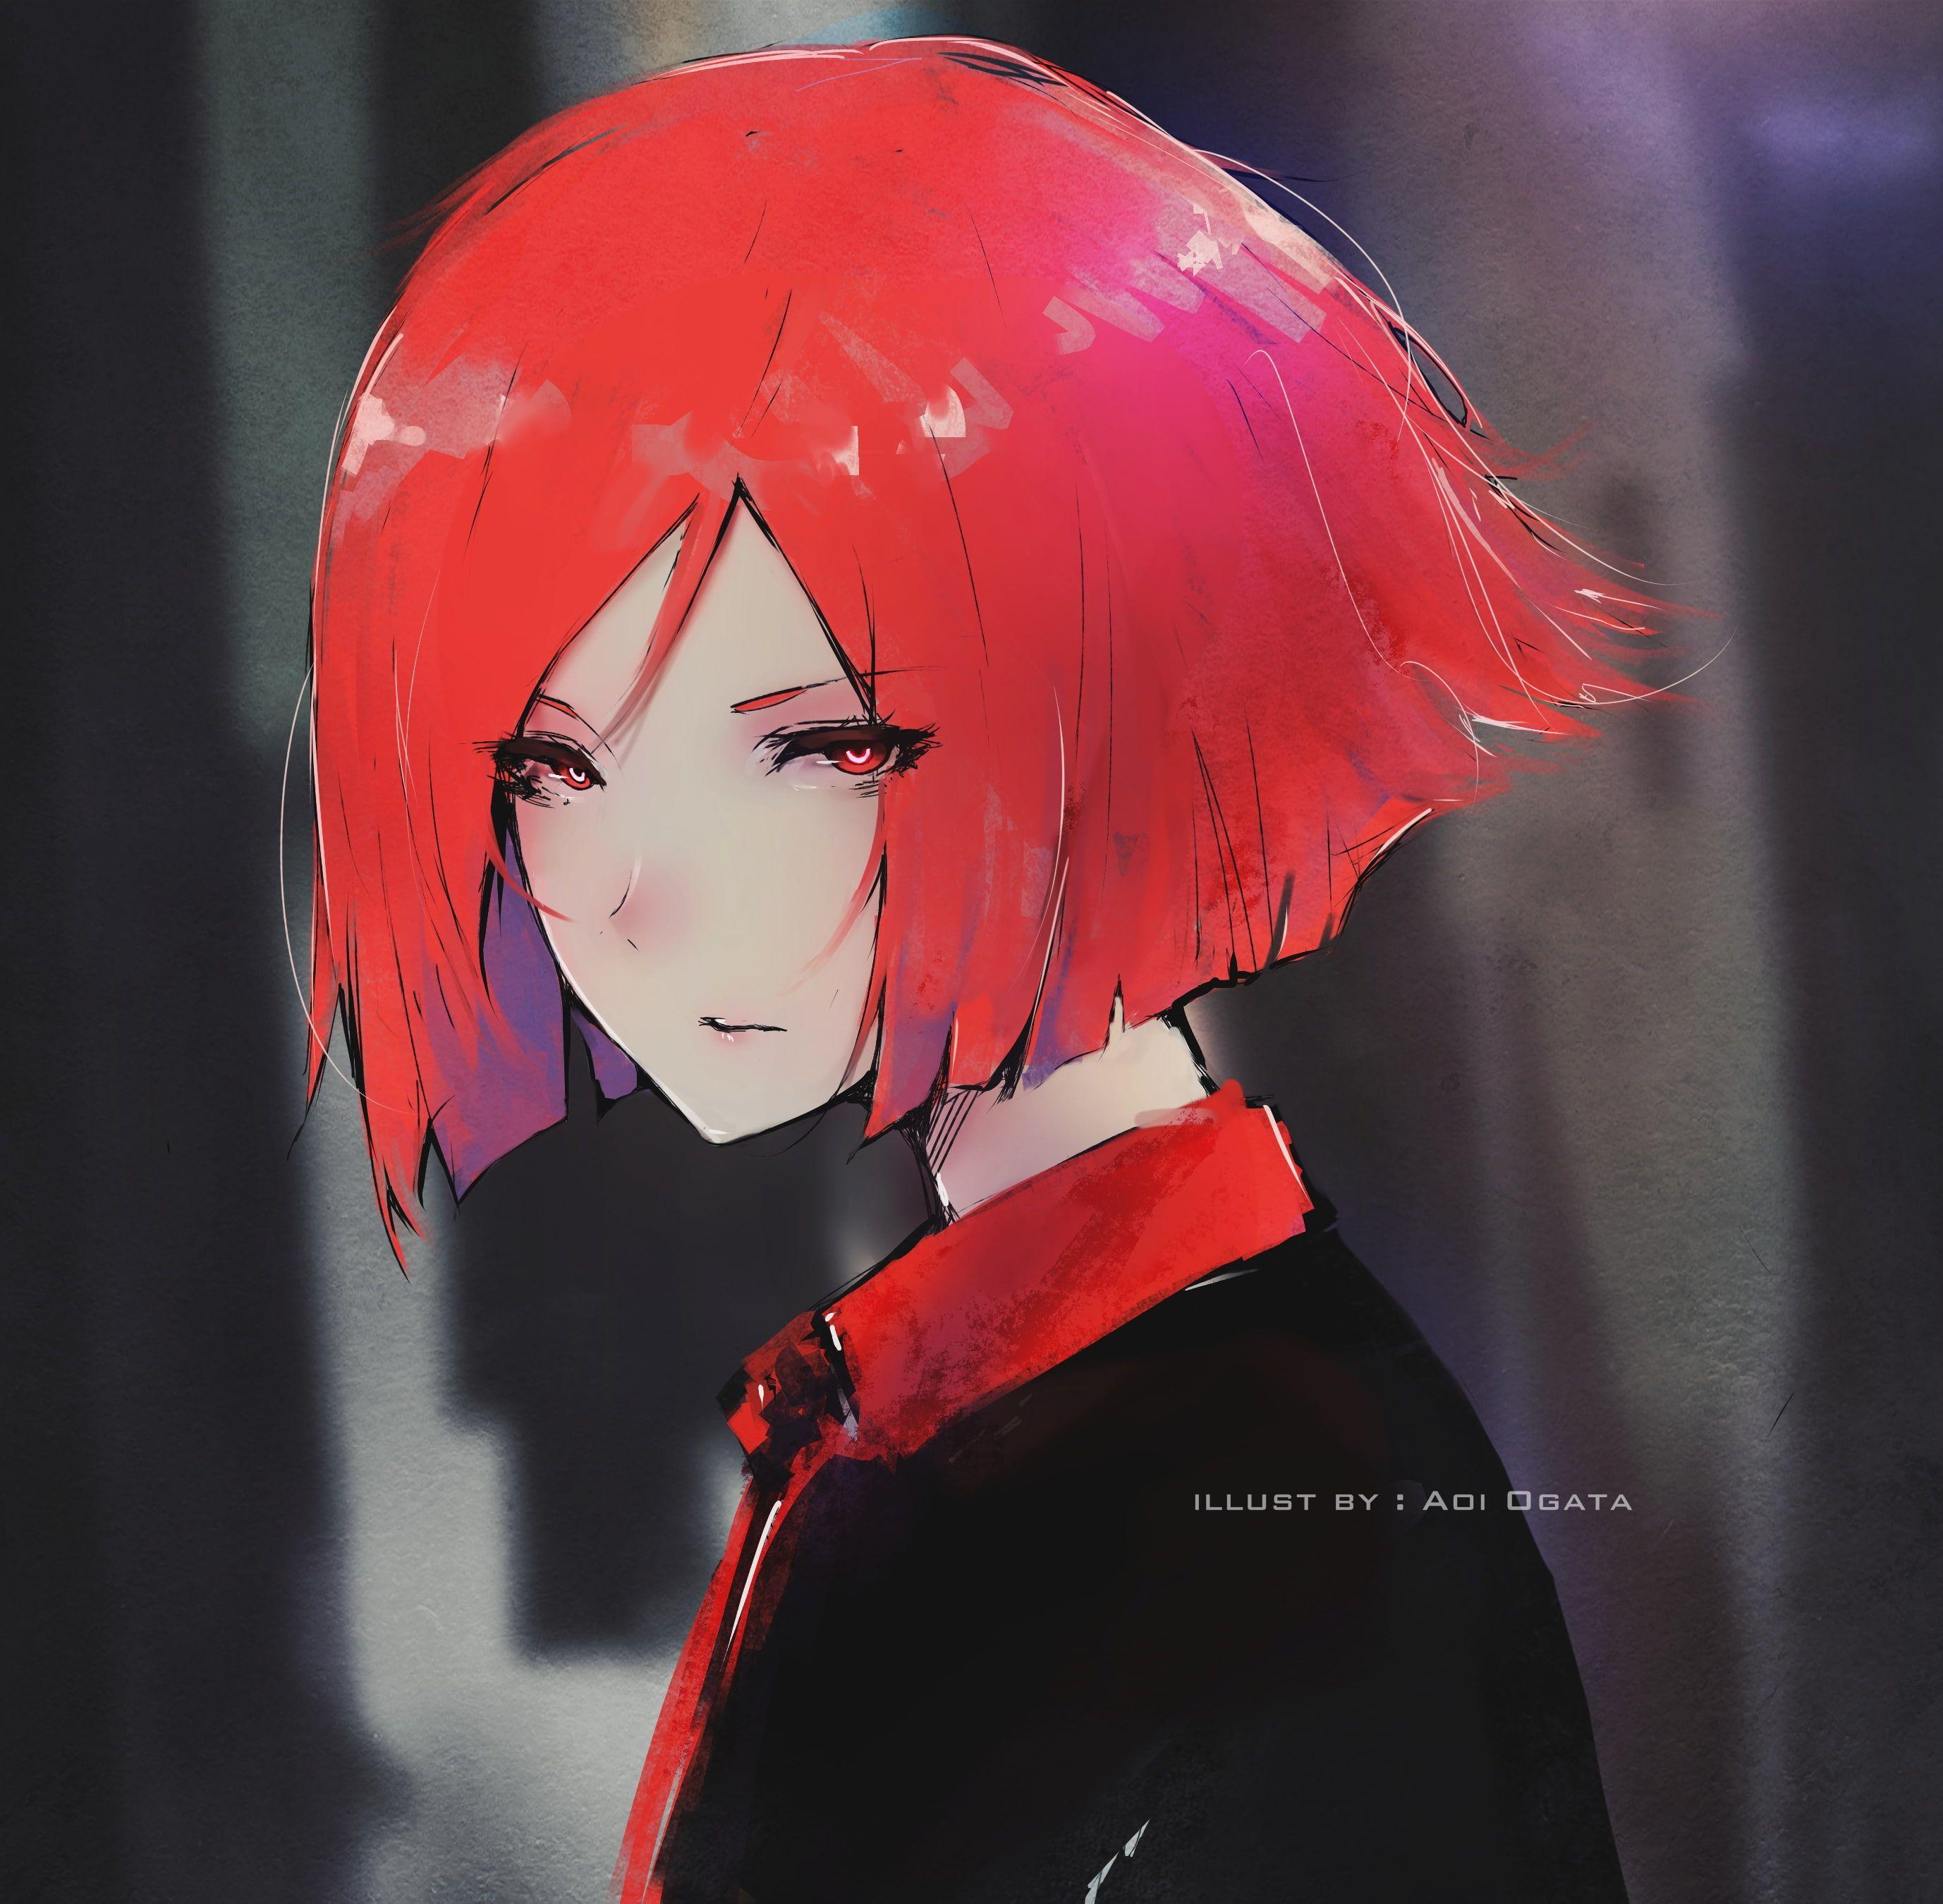 Aoi Ogata #redhead digital art #8K #wallpaper #hdwallpaper